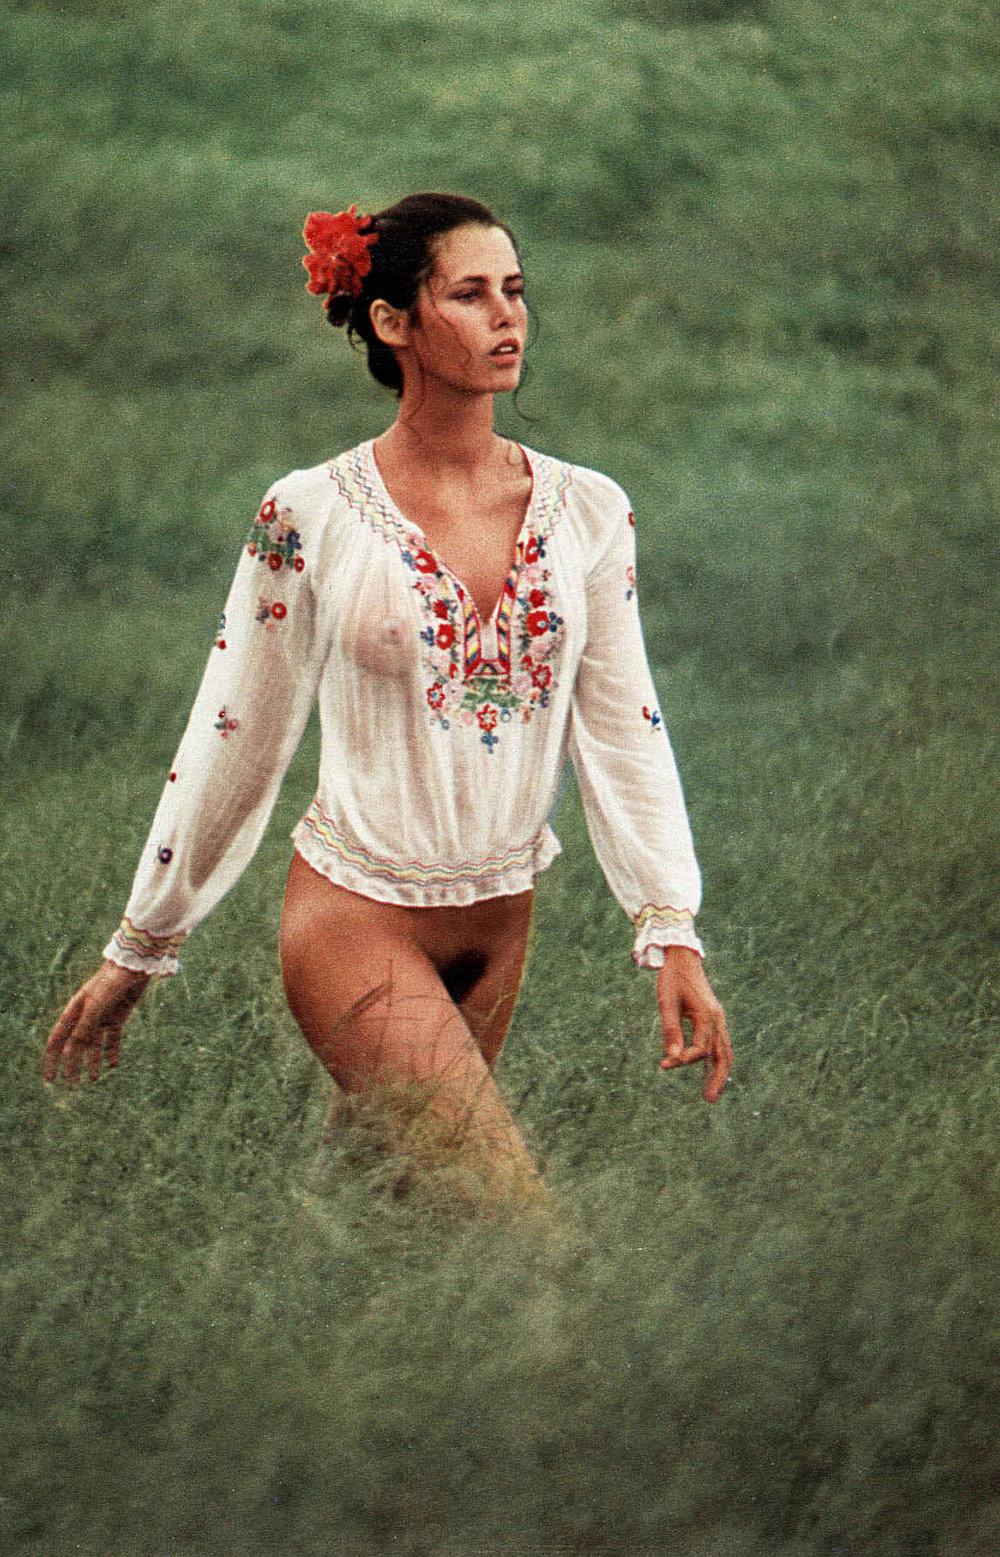 Dayle-Haddon-Playboy-Germany-1973.JPG